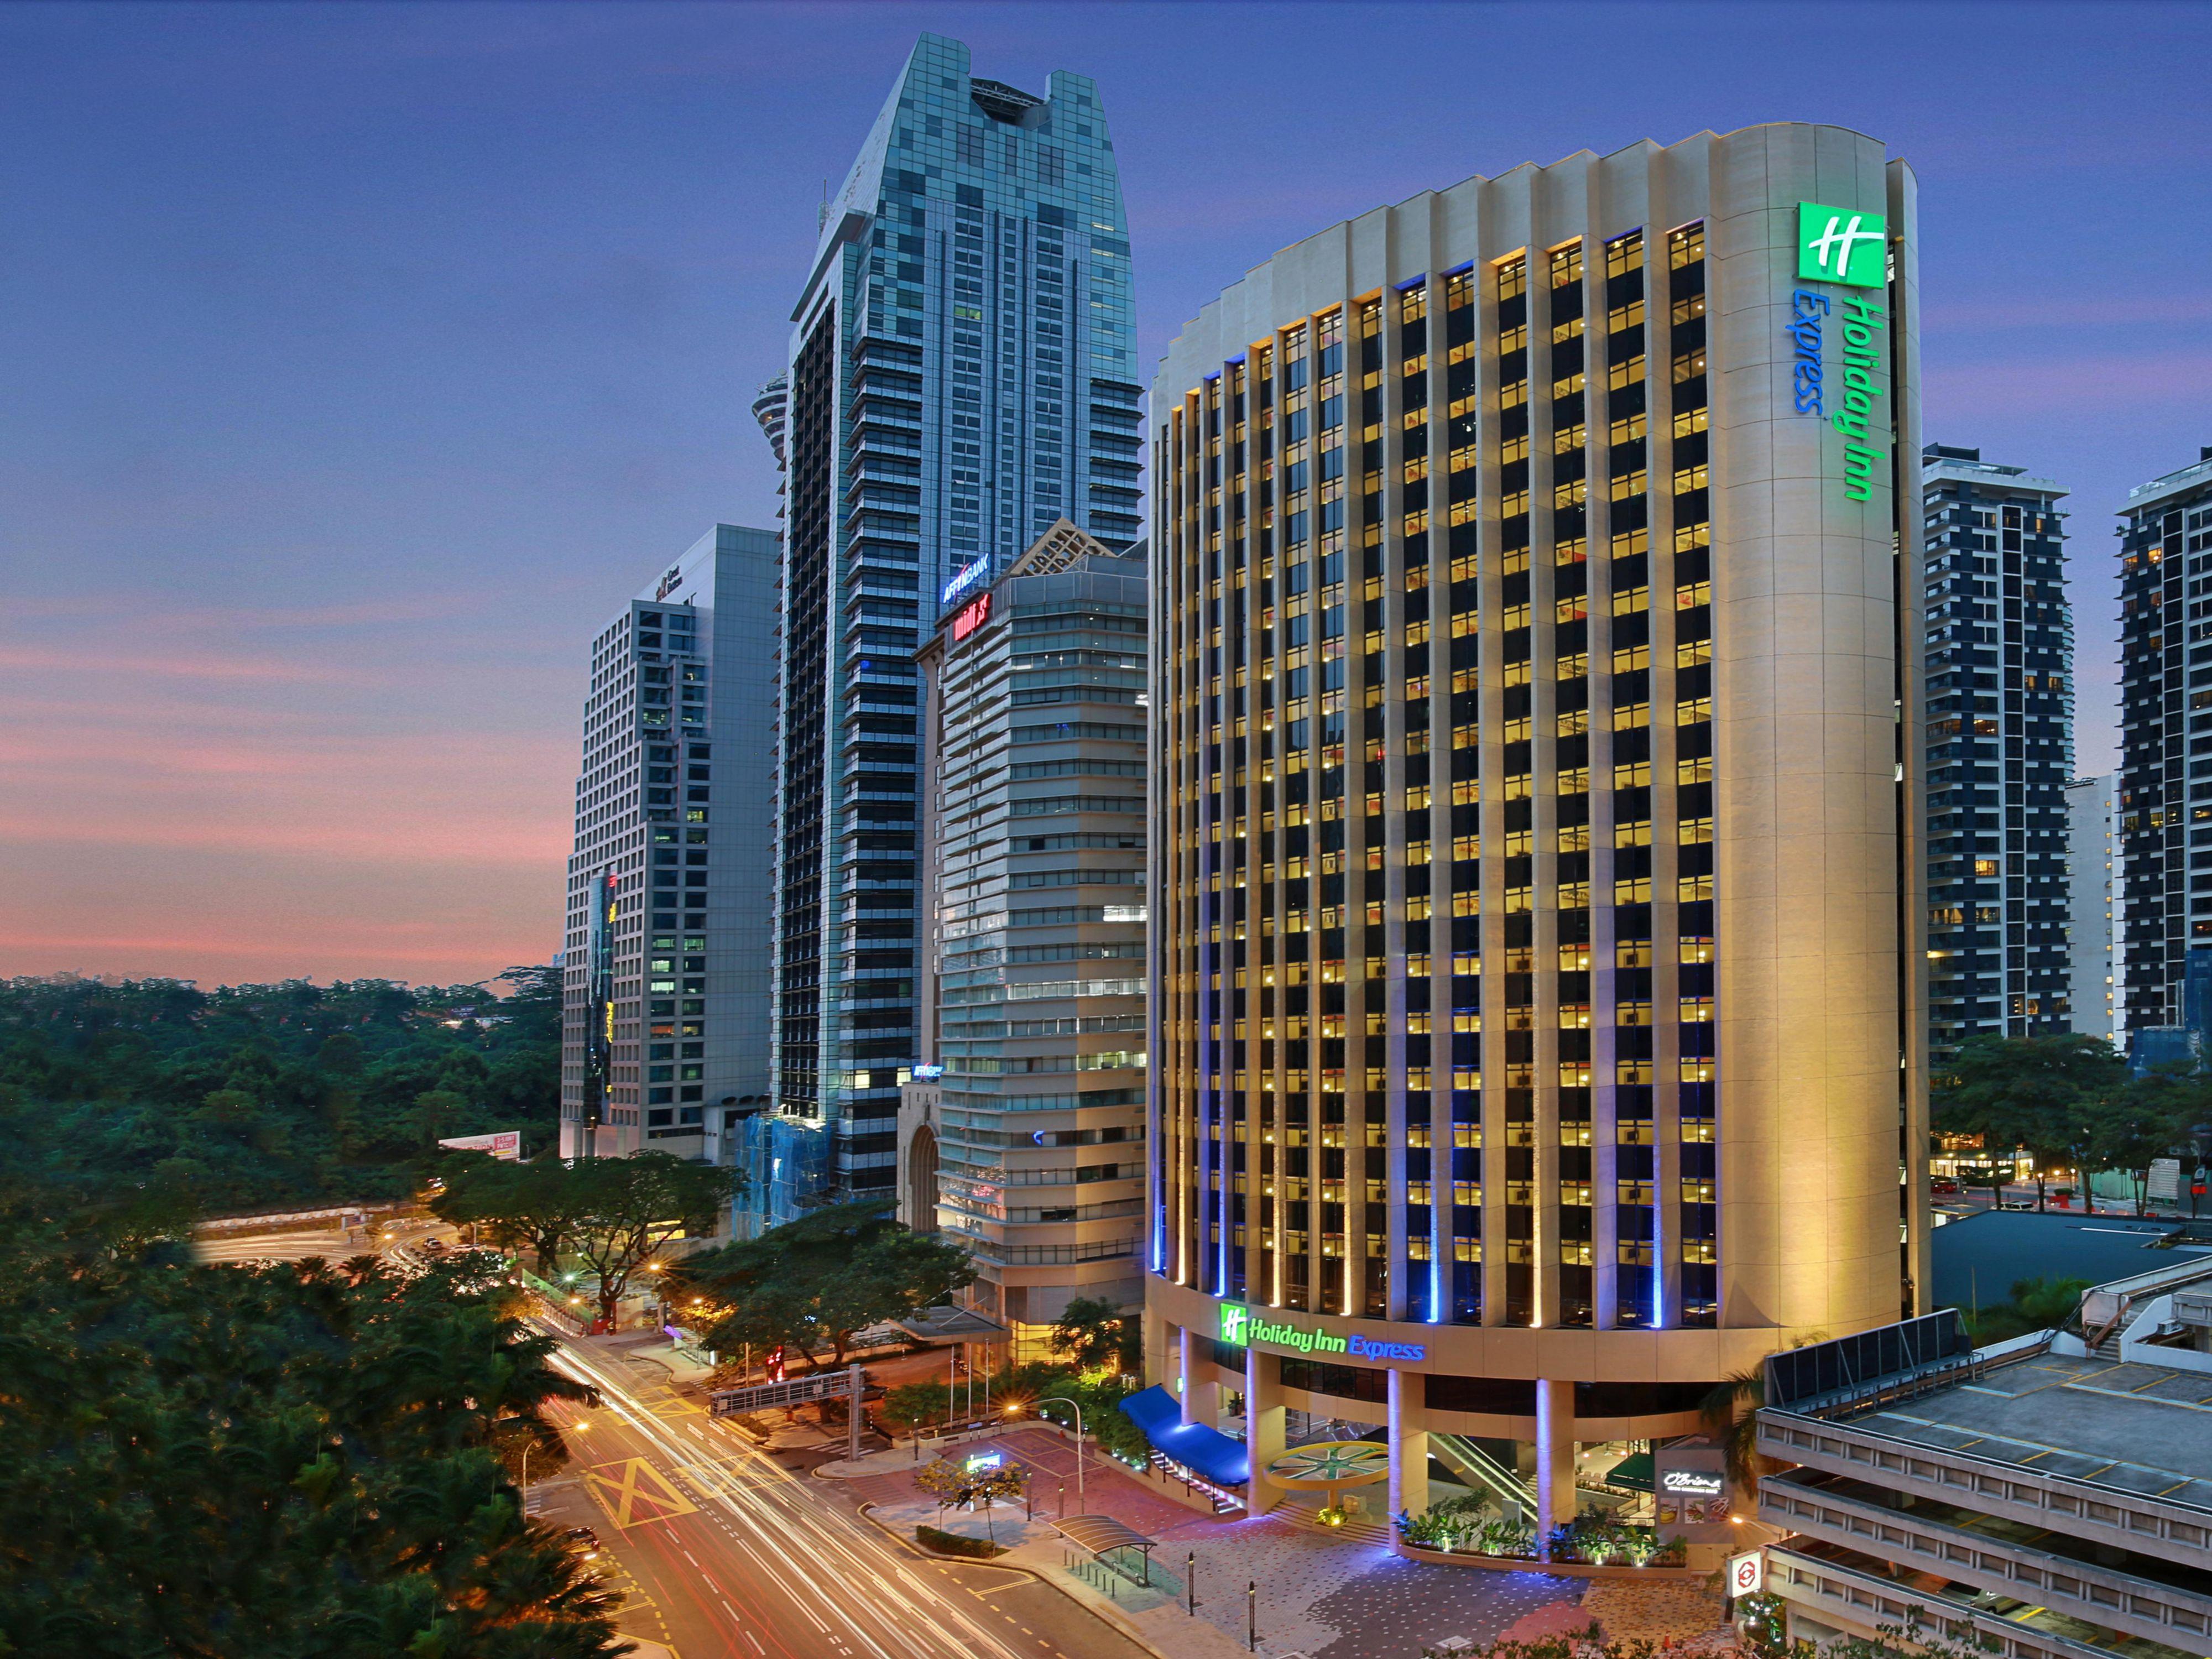 Hotel Holiday Inn City Centre